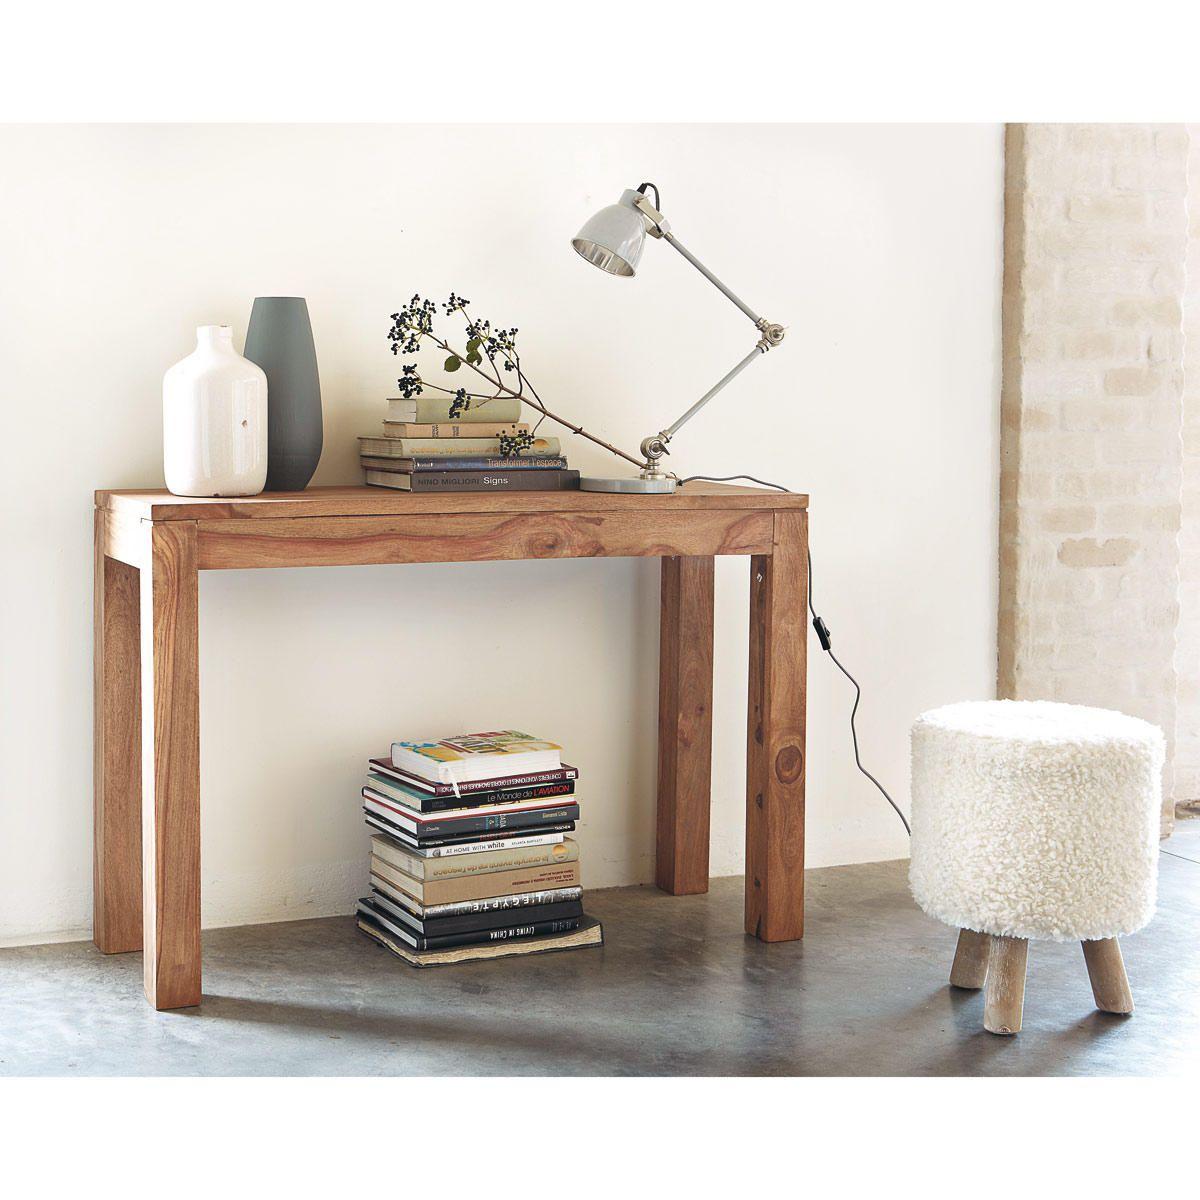 230 console maisons du monde stockholm 120x40 sheesham massif inde d co id es achat. Black Bedroom Furniture Sets. Home Design Ideas